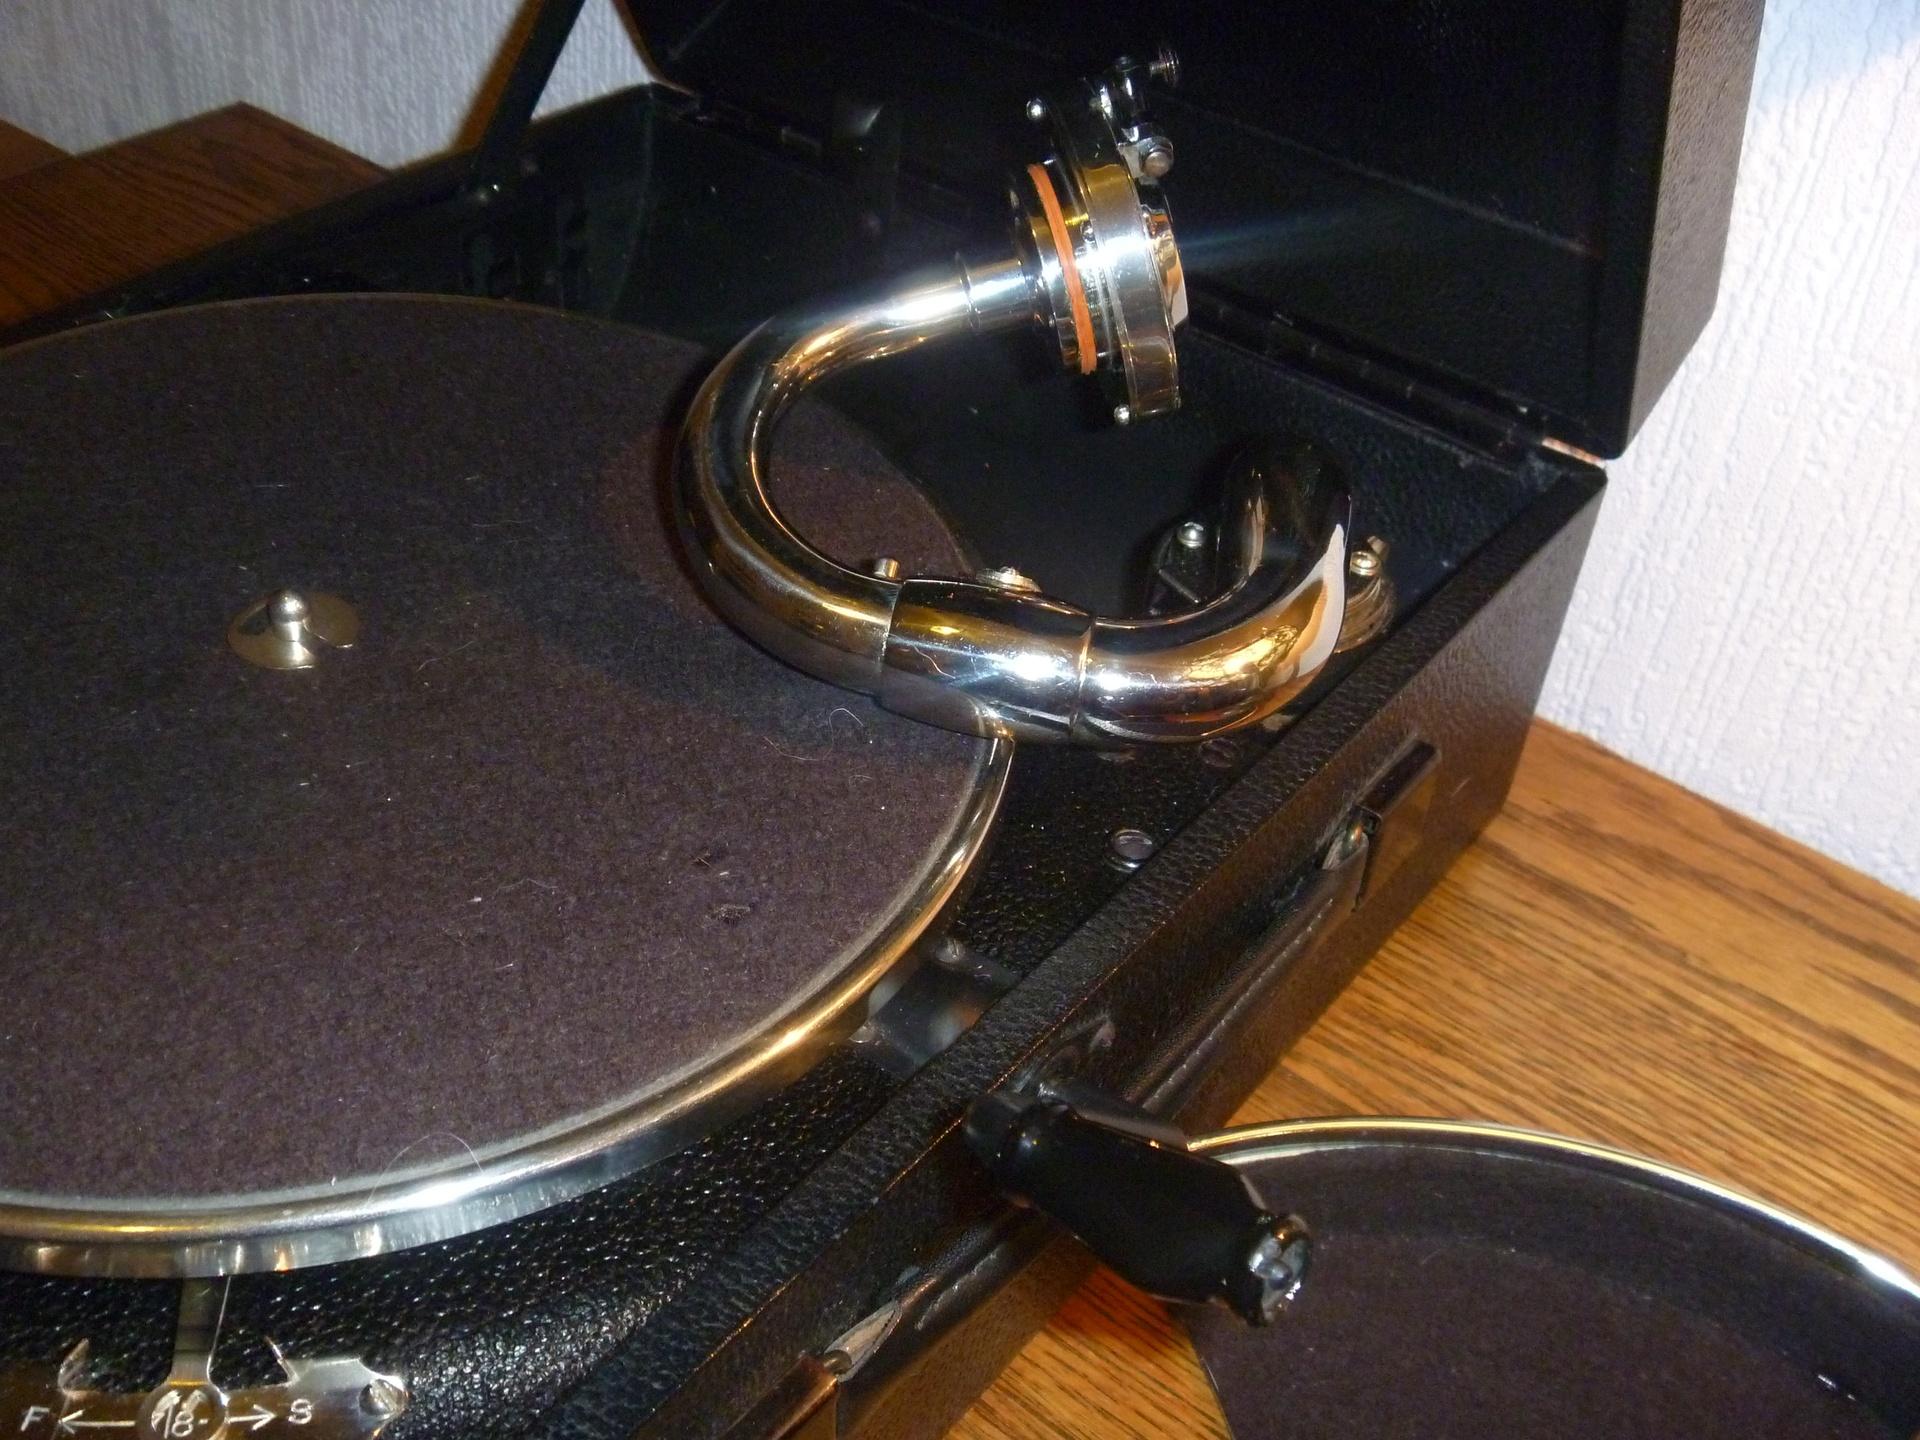 HMV Model 97b 8